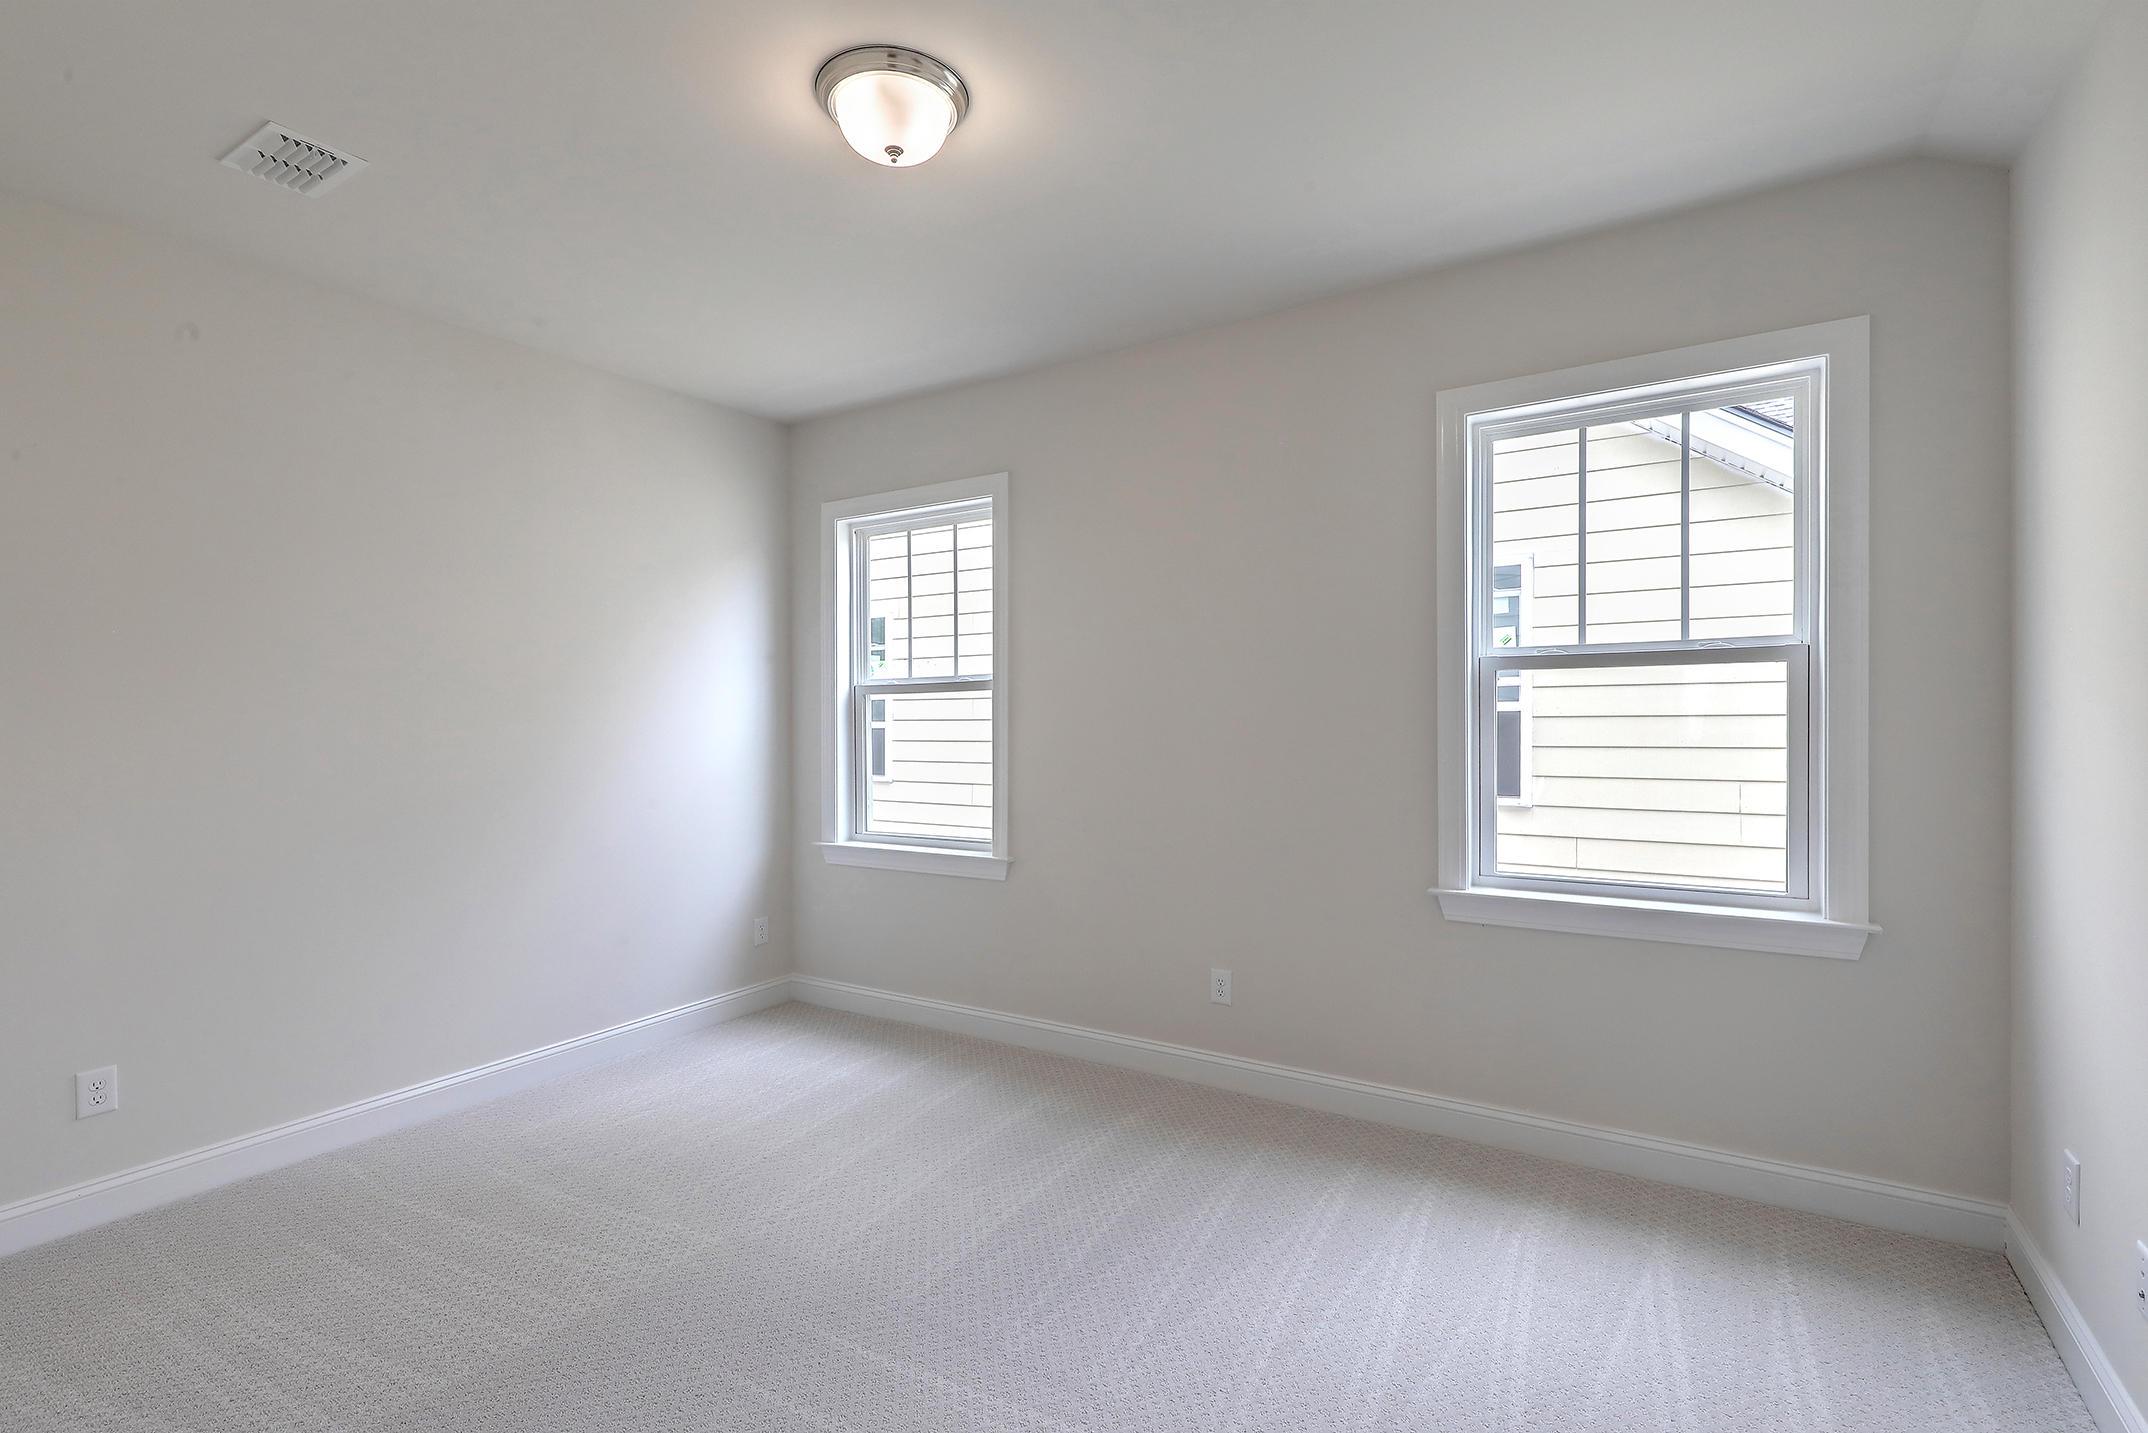 Bentley Park Homes For Sale - 1277 Gannett, Mount Pleasant, SC - 4